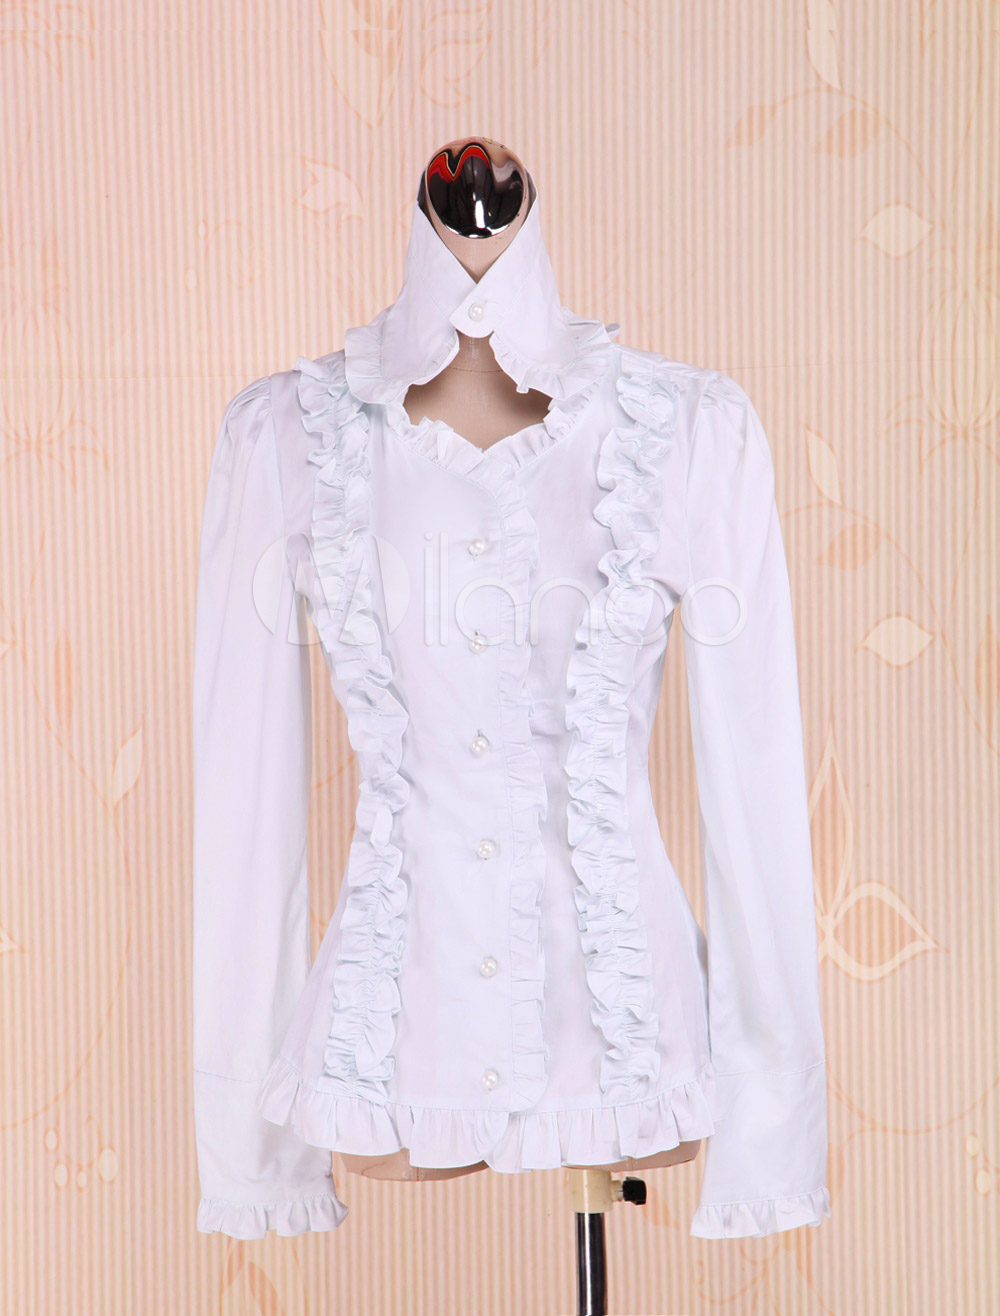 Cotton White Ruffles Lolita Blouse